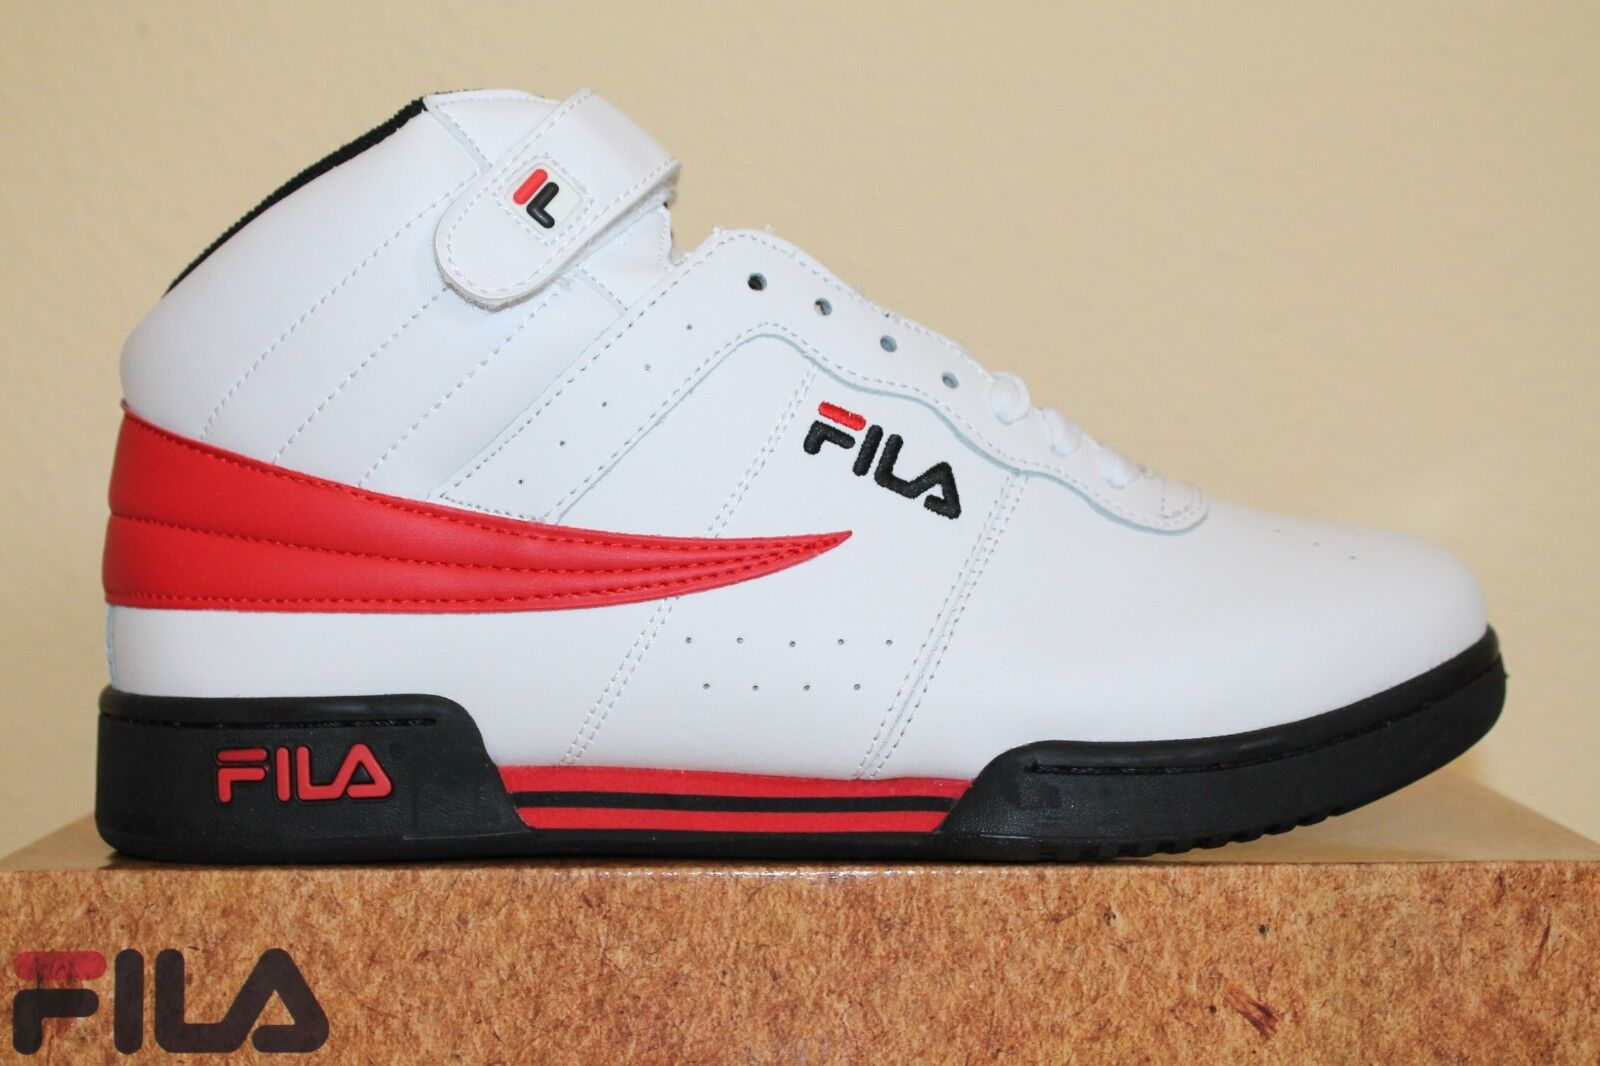 White / Black / Fila Red